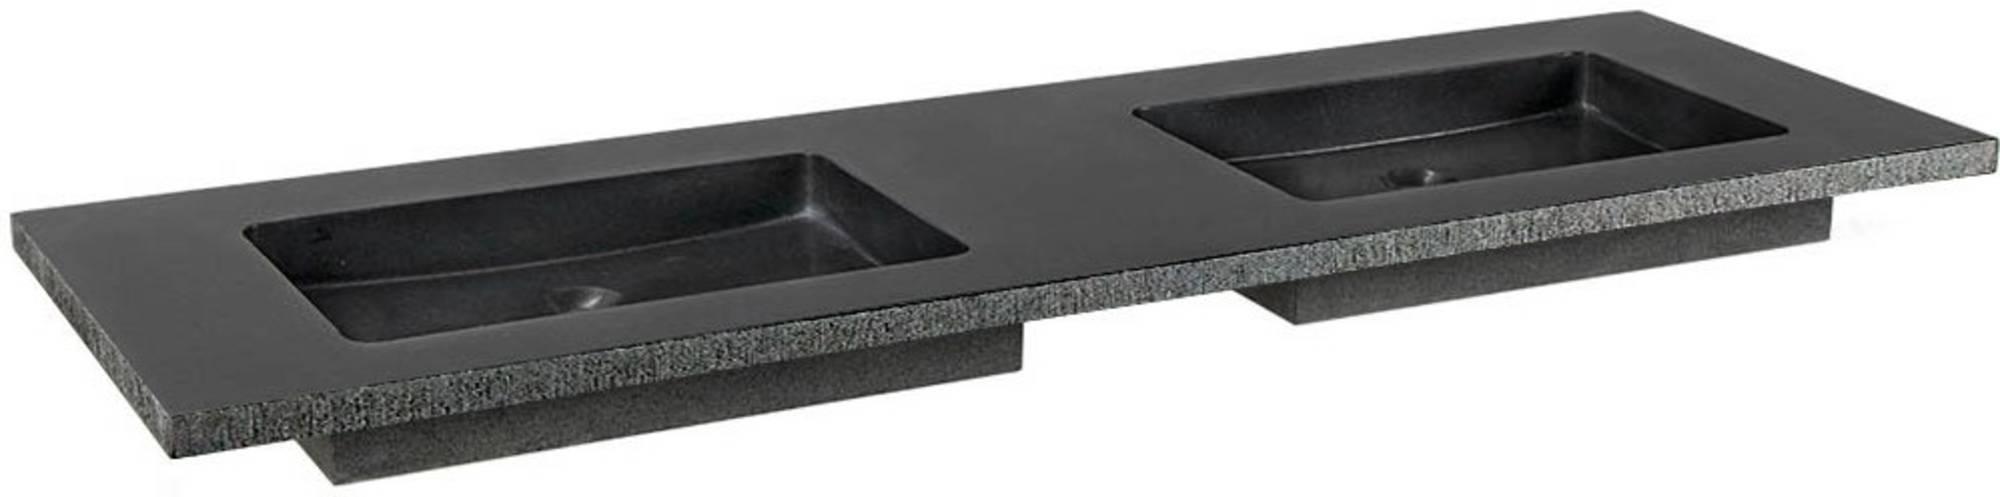 Ben Naturno Wastafel Graniet Gezoet Gefrijnd 160,5x51,5x3 cm zonder Krg. Zwart